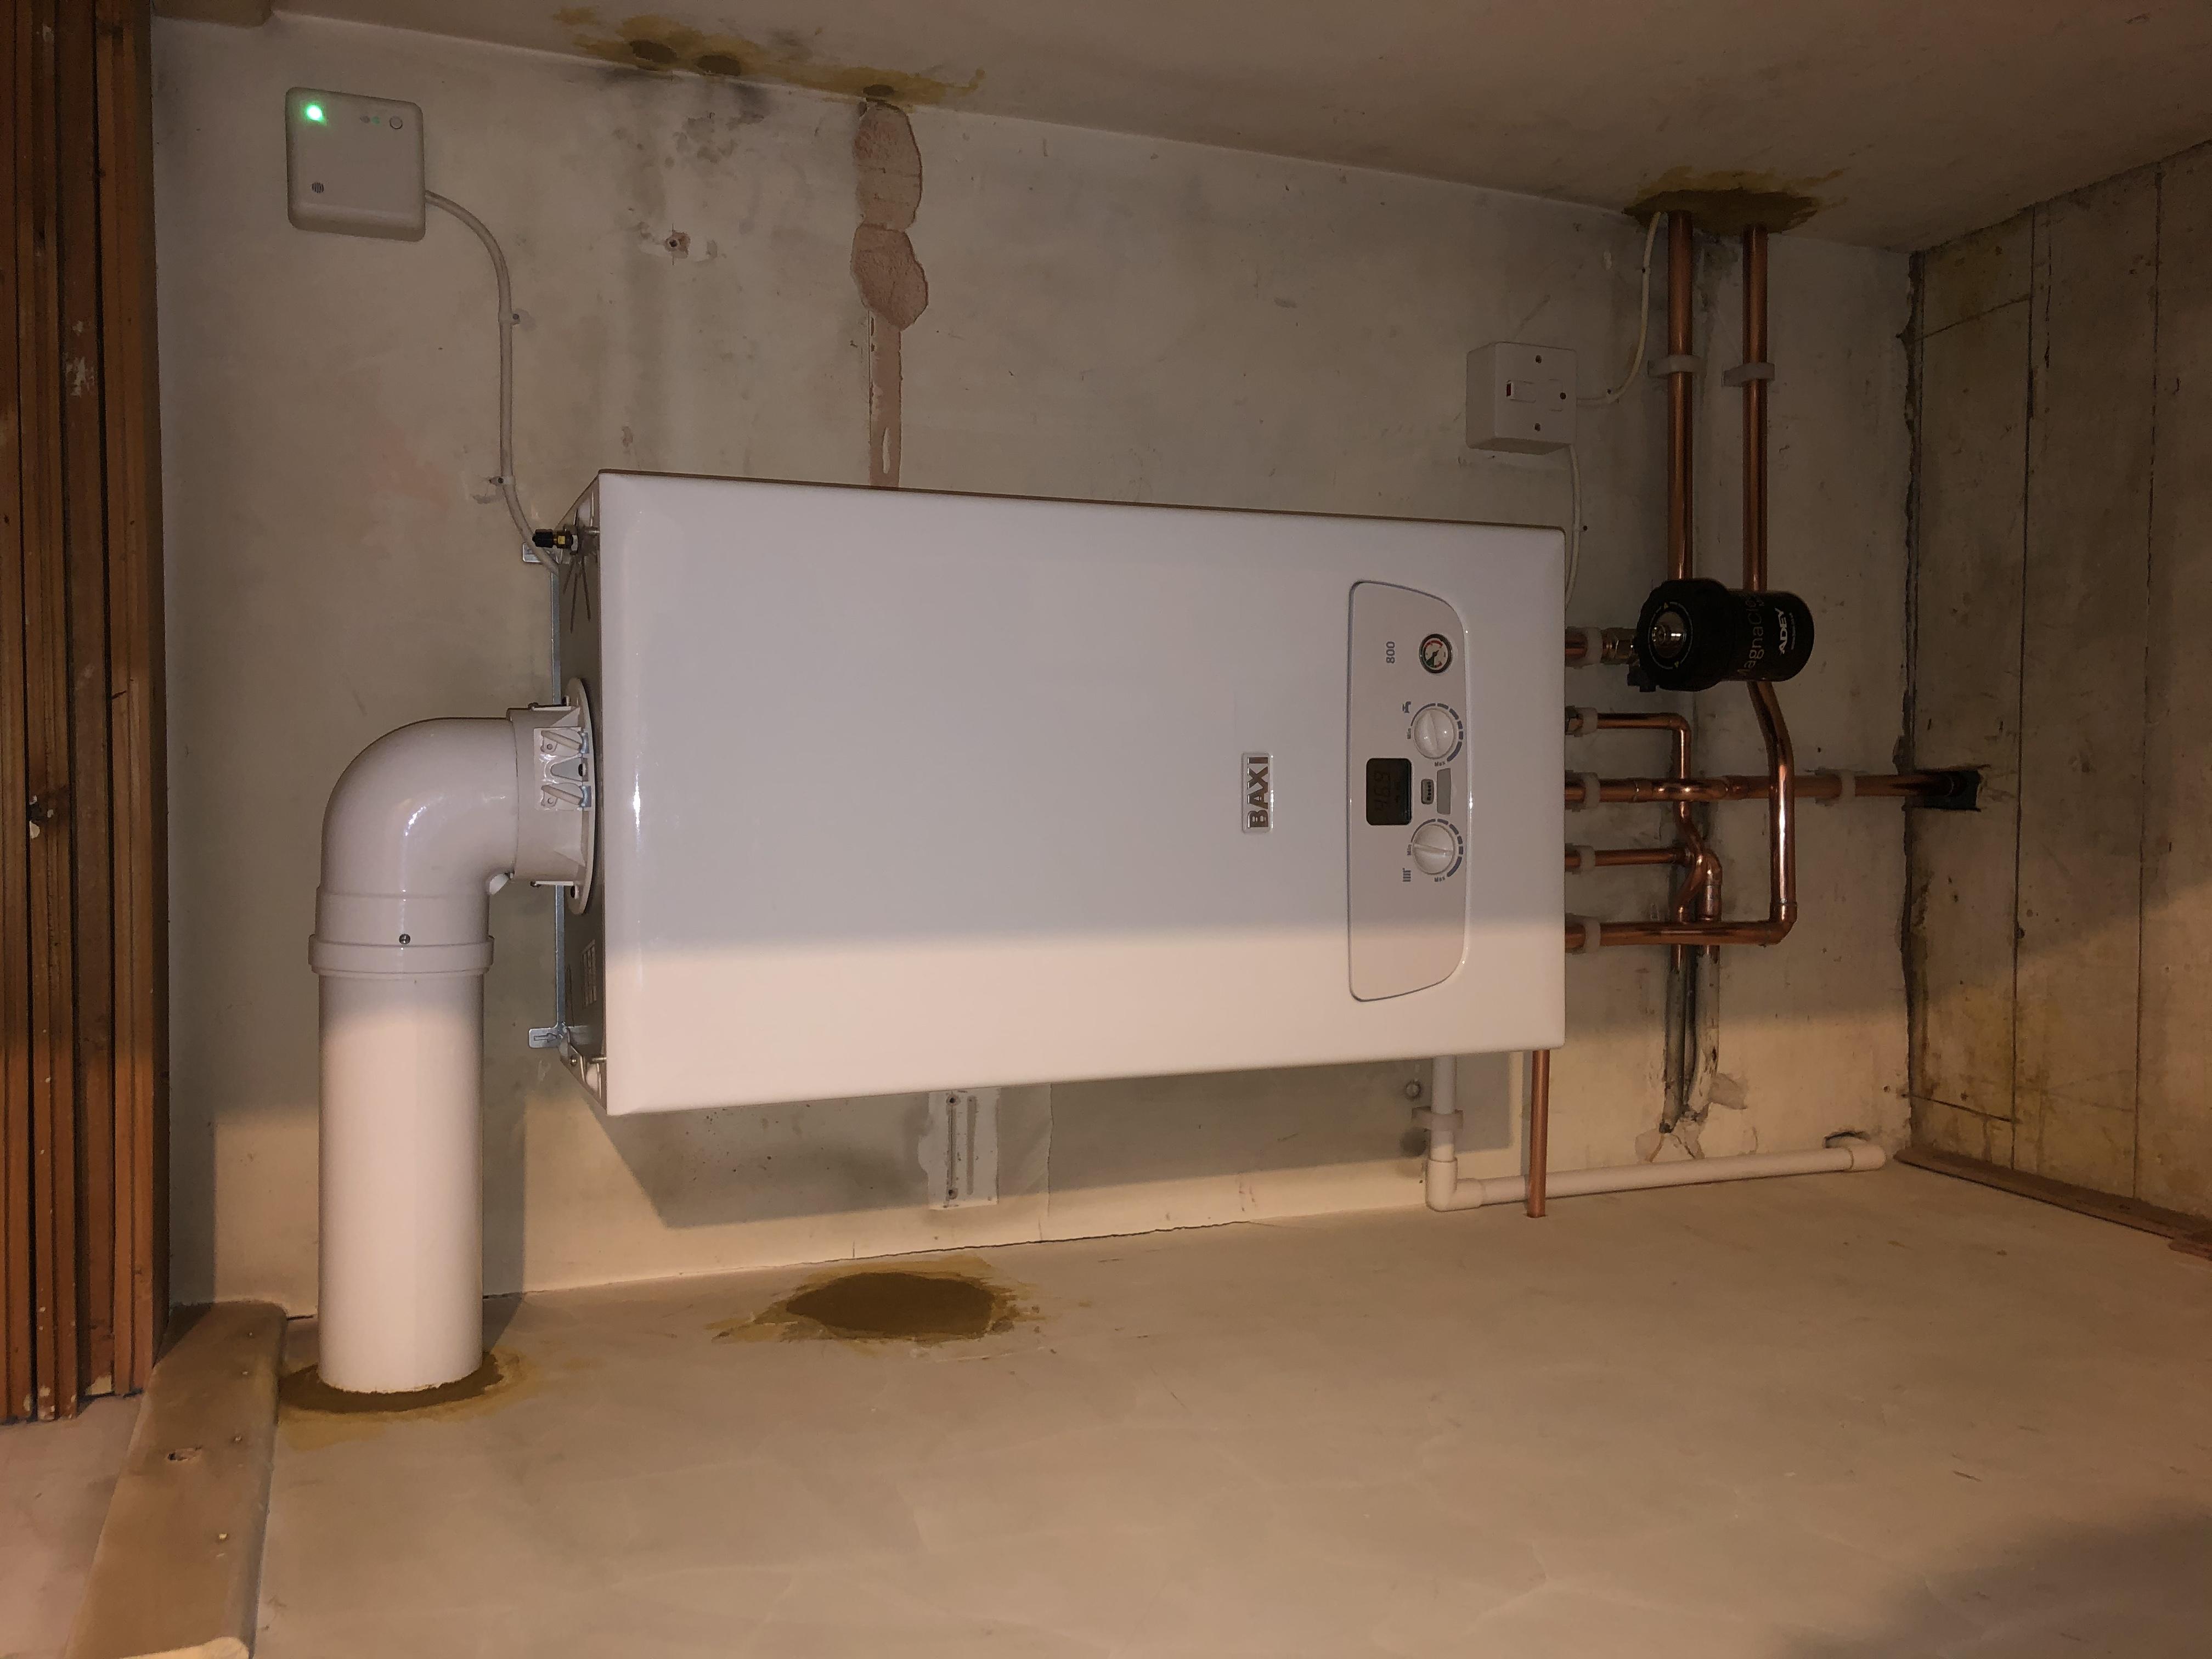 Main photo for MP Plumbing & Heating